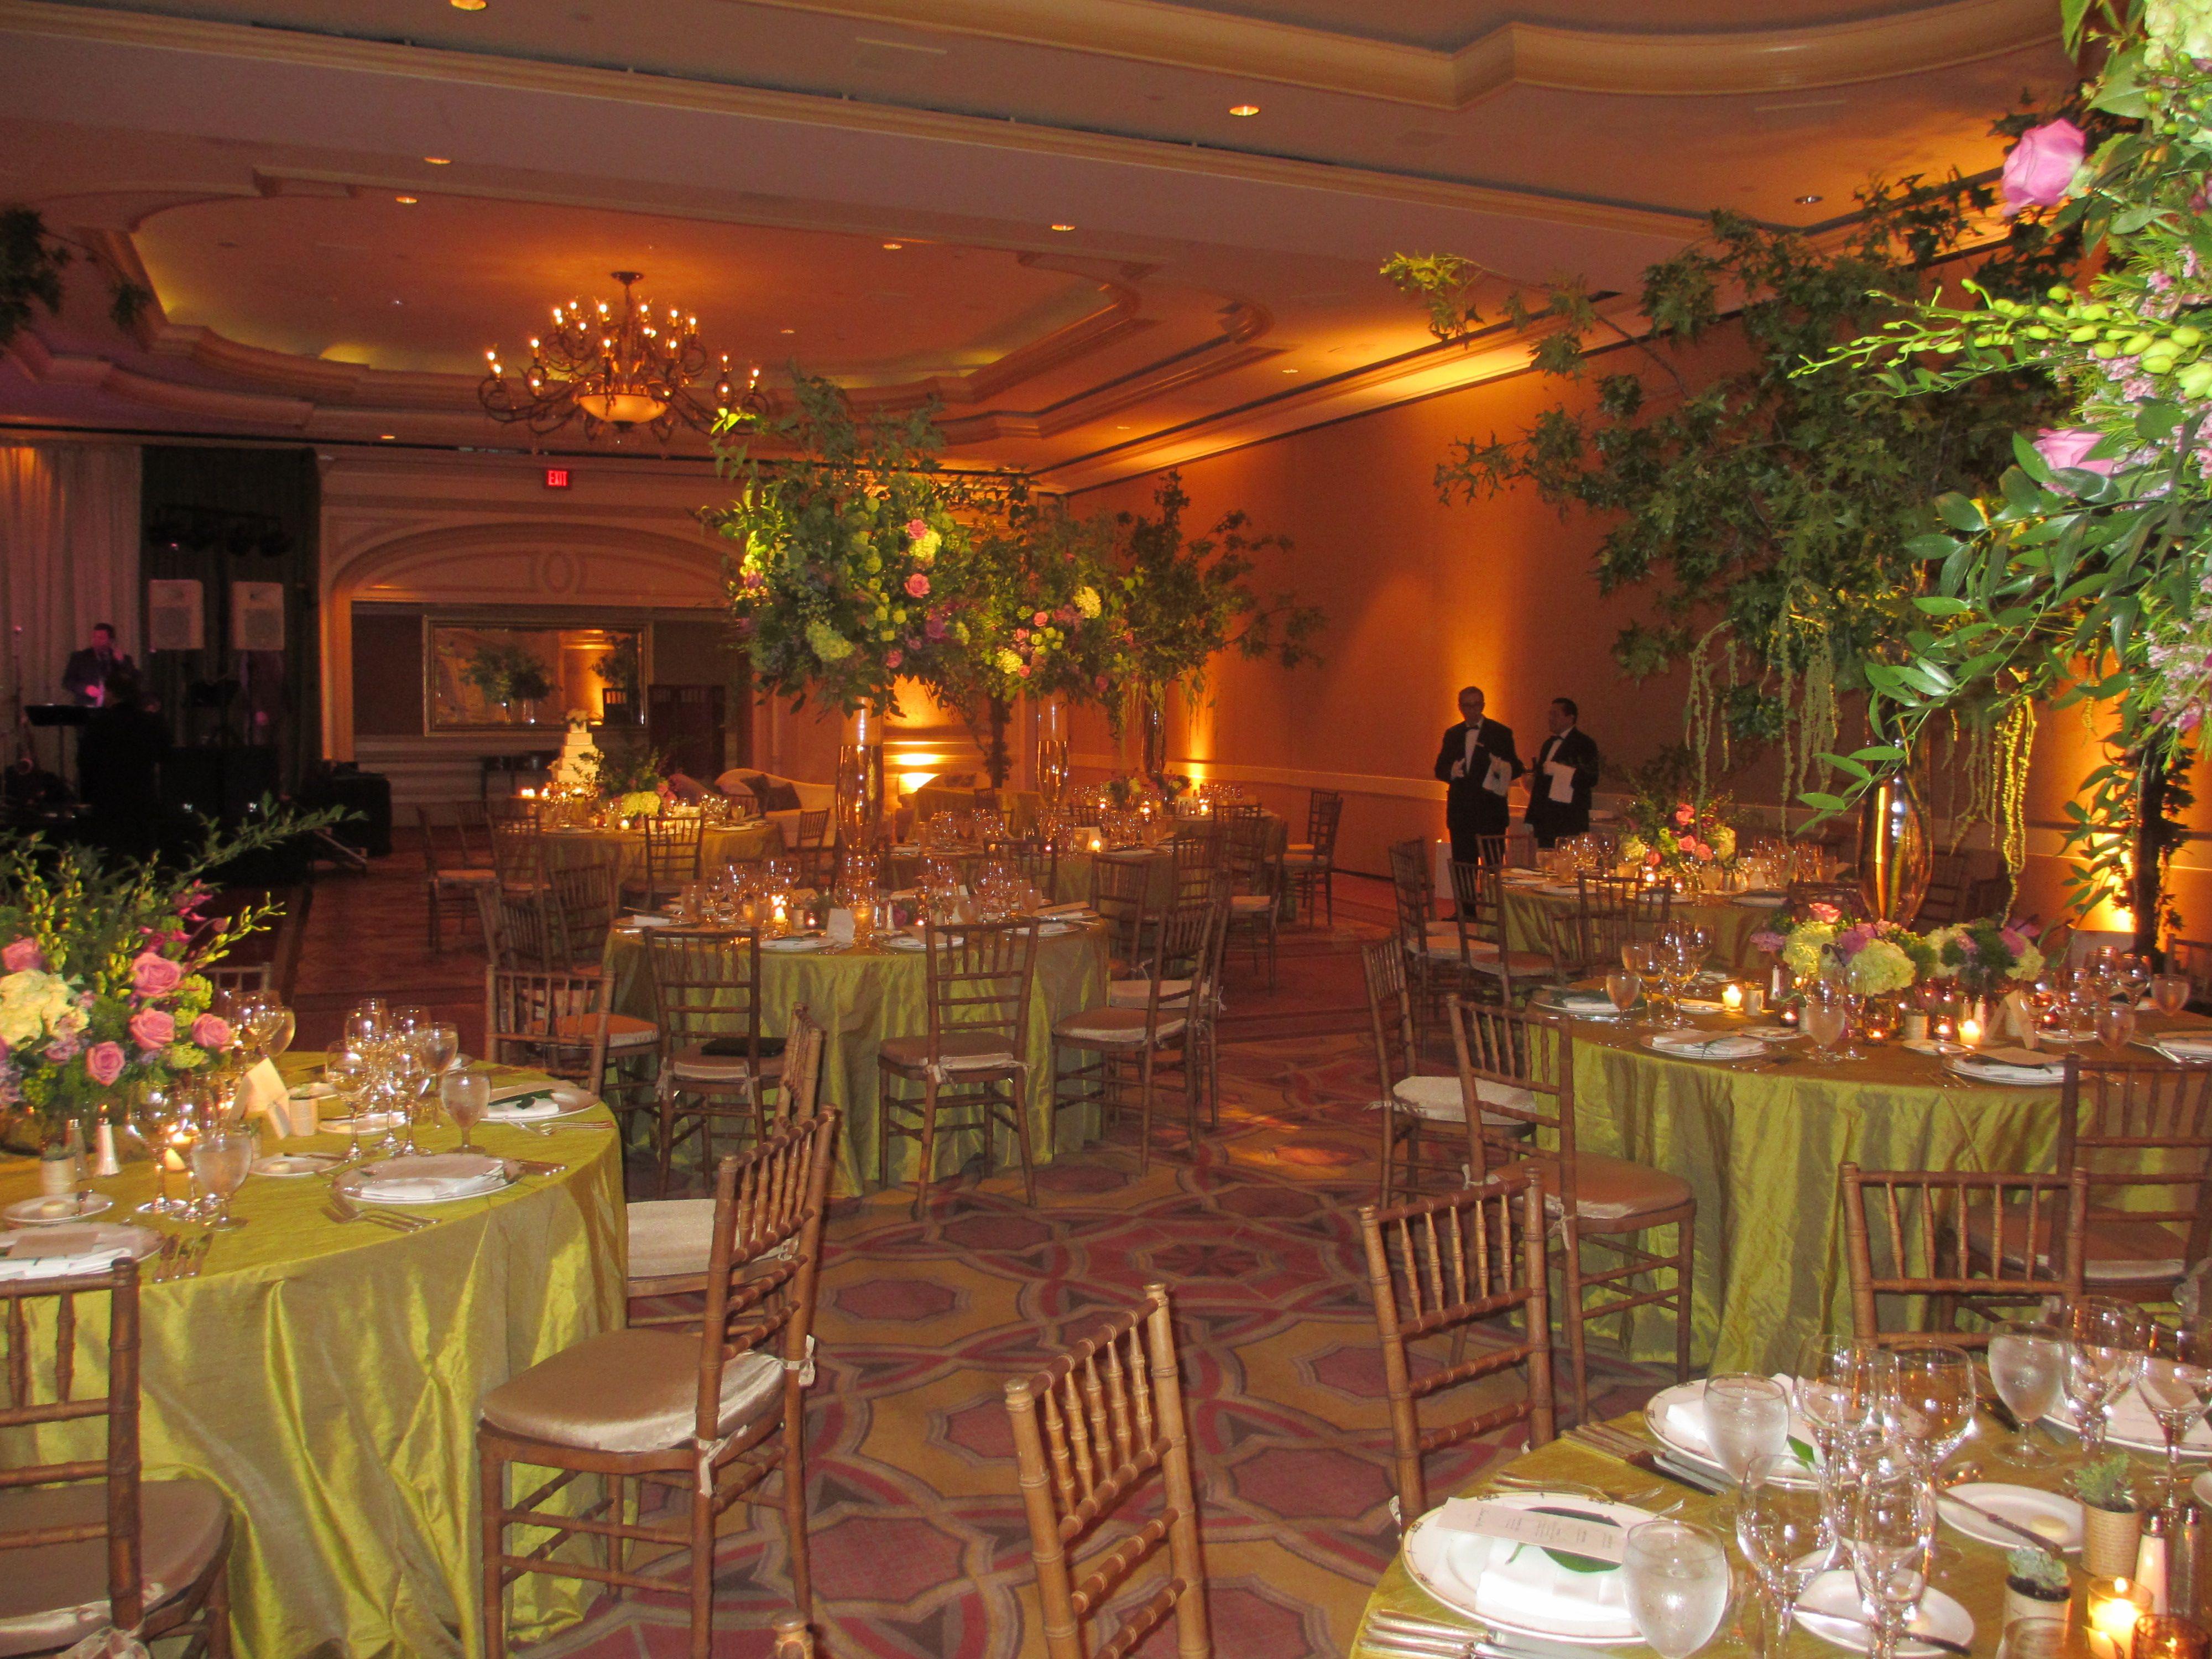 Enchanted Garden Themed Wedding Themed Events